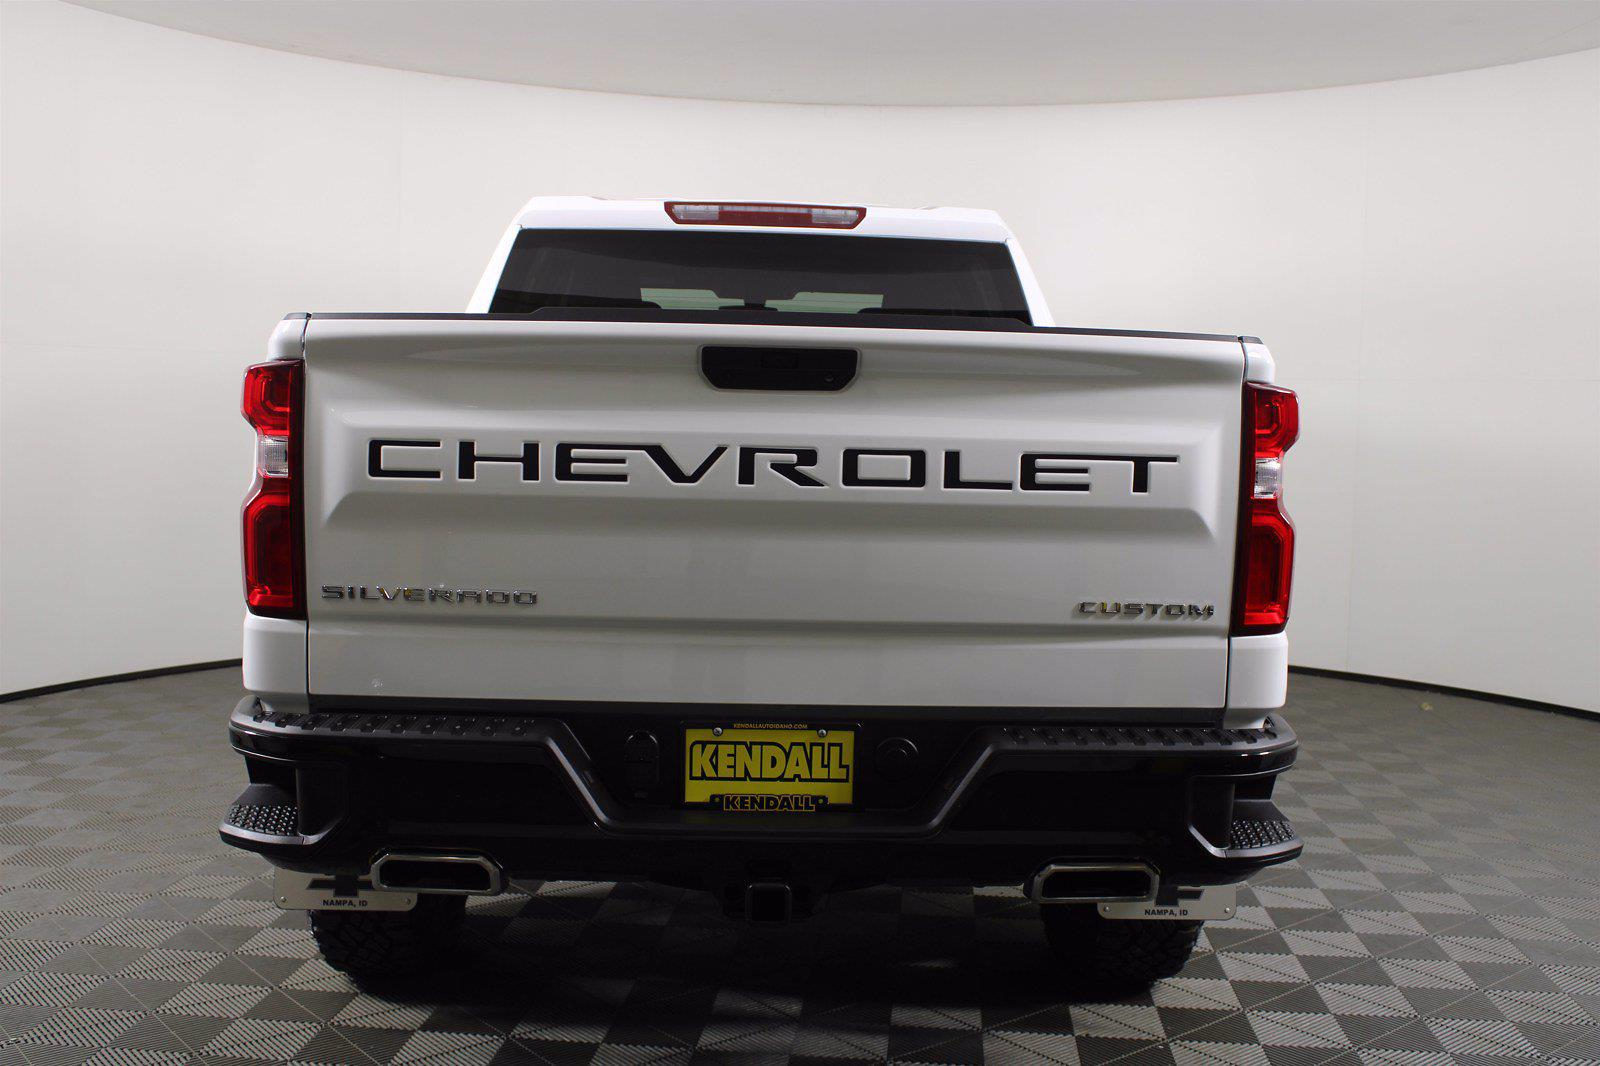 2020 Chevrolet Silverado 1500 Crew Cab 4x4, Pickup #DTC1713 - photo 3